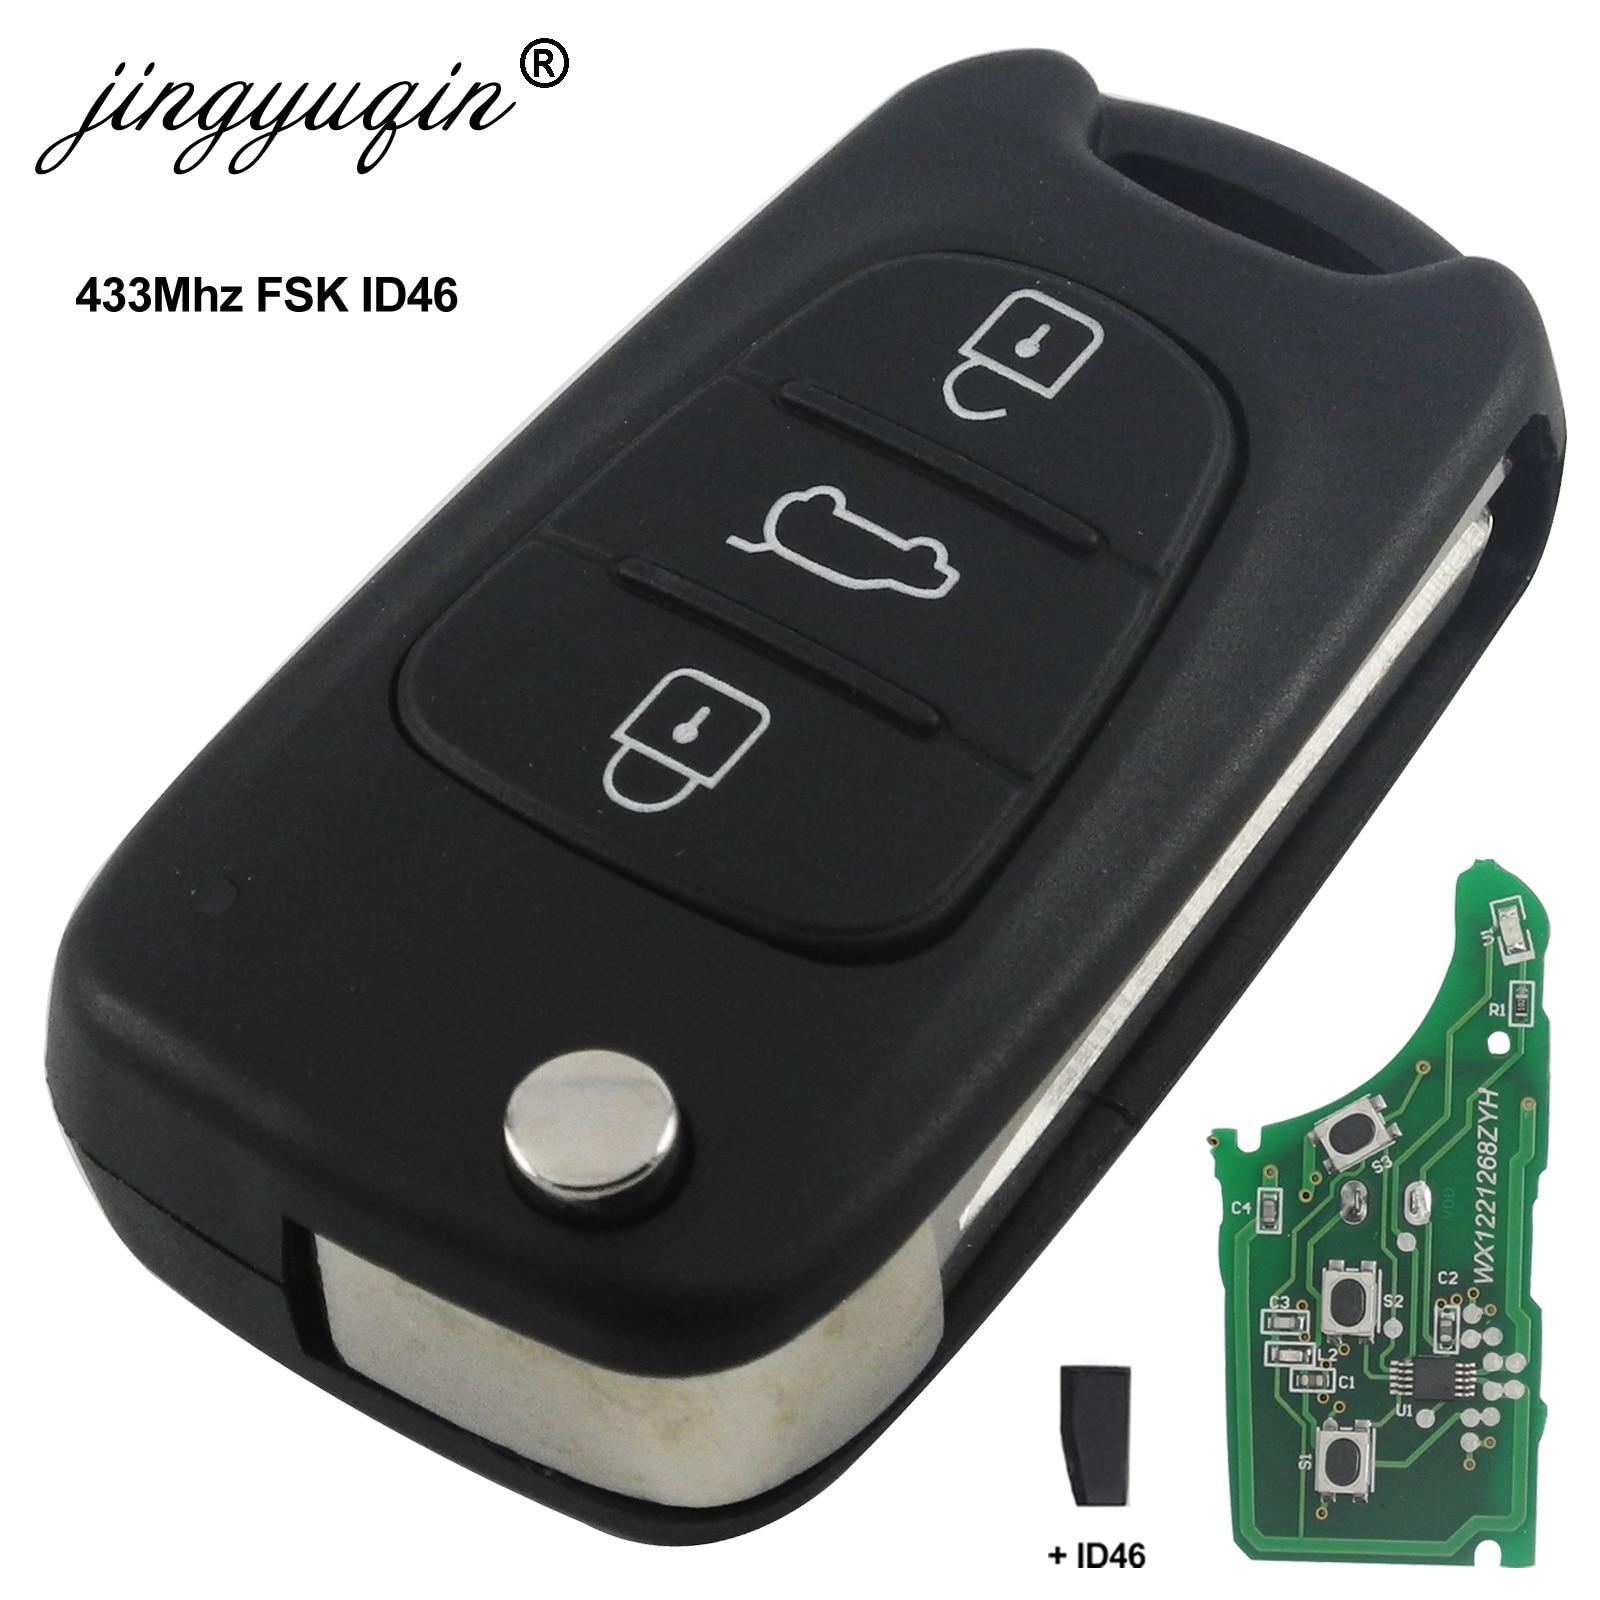 jingyuqin For Hyundai I20 I30 IX35 Avante 433Mhz ID46 Chip 3 Buttons Flip Folding Car Remote Key Fob-in Car Key from Automobiles & Motorcycles